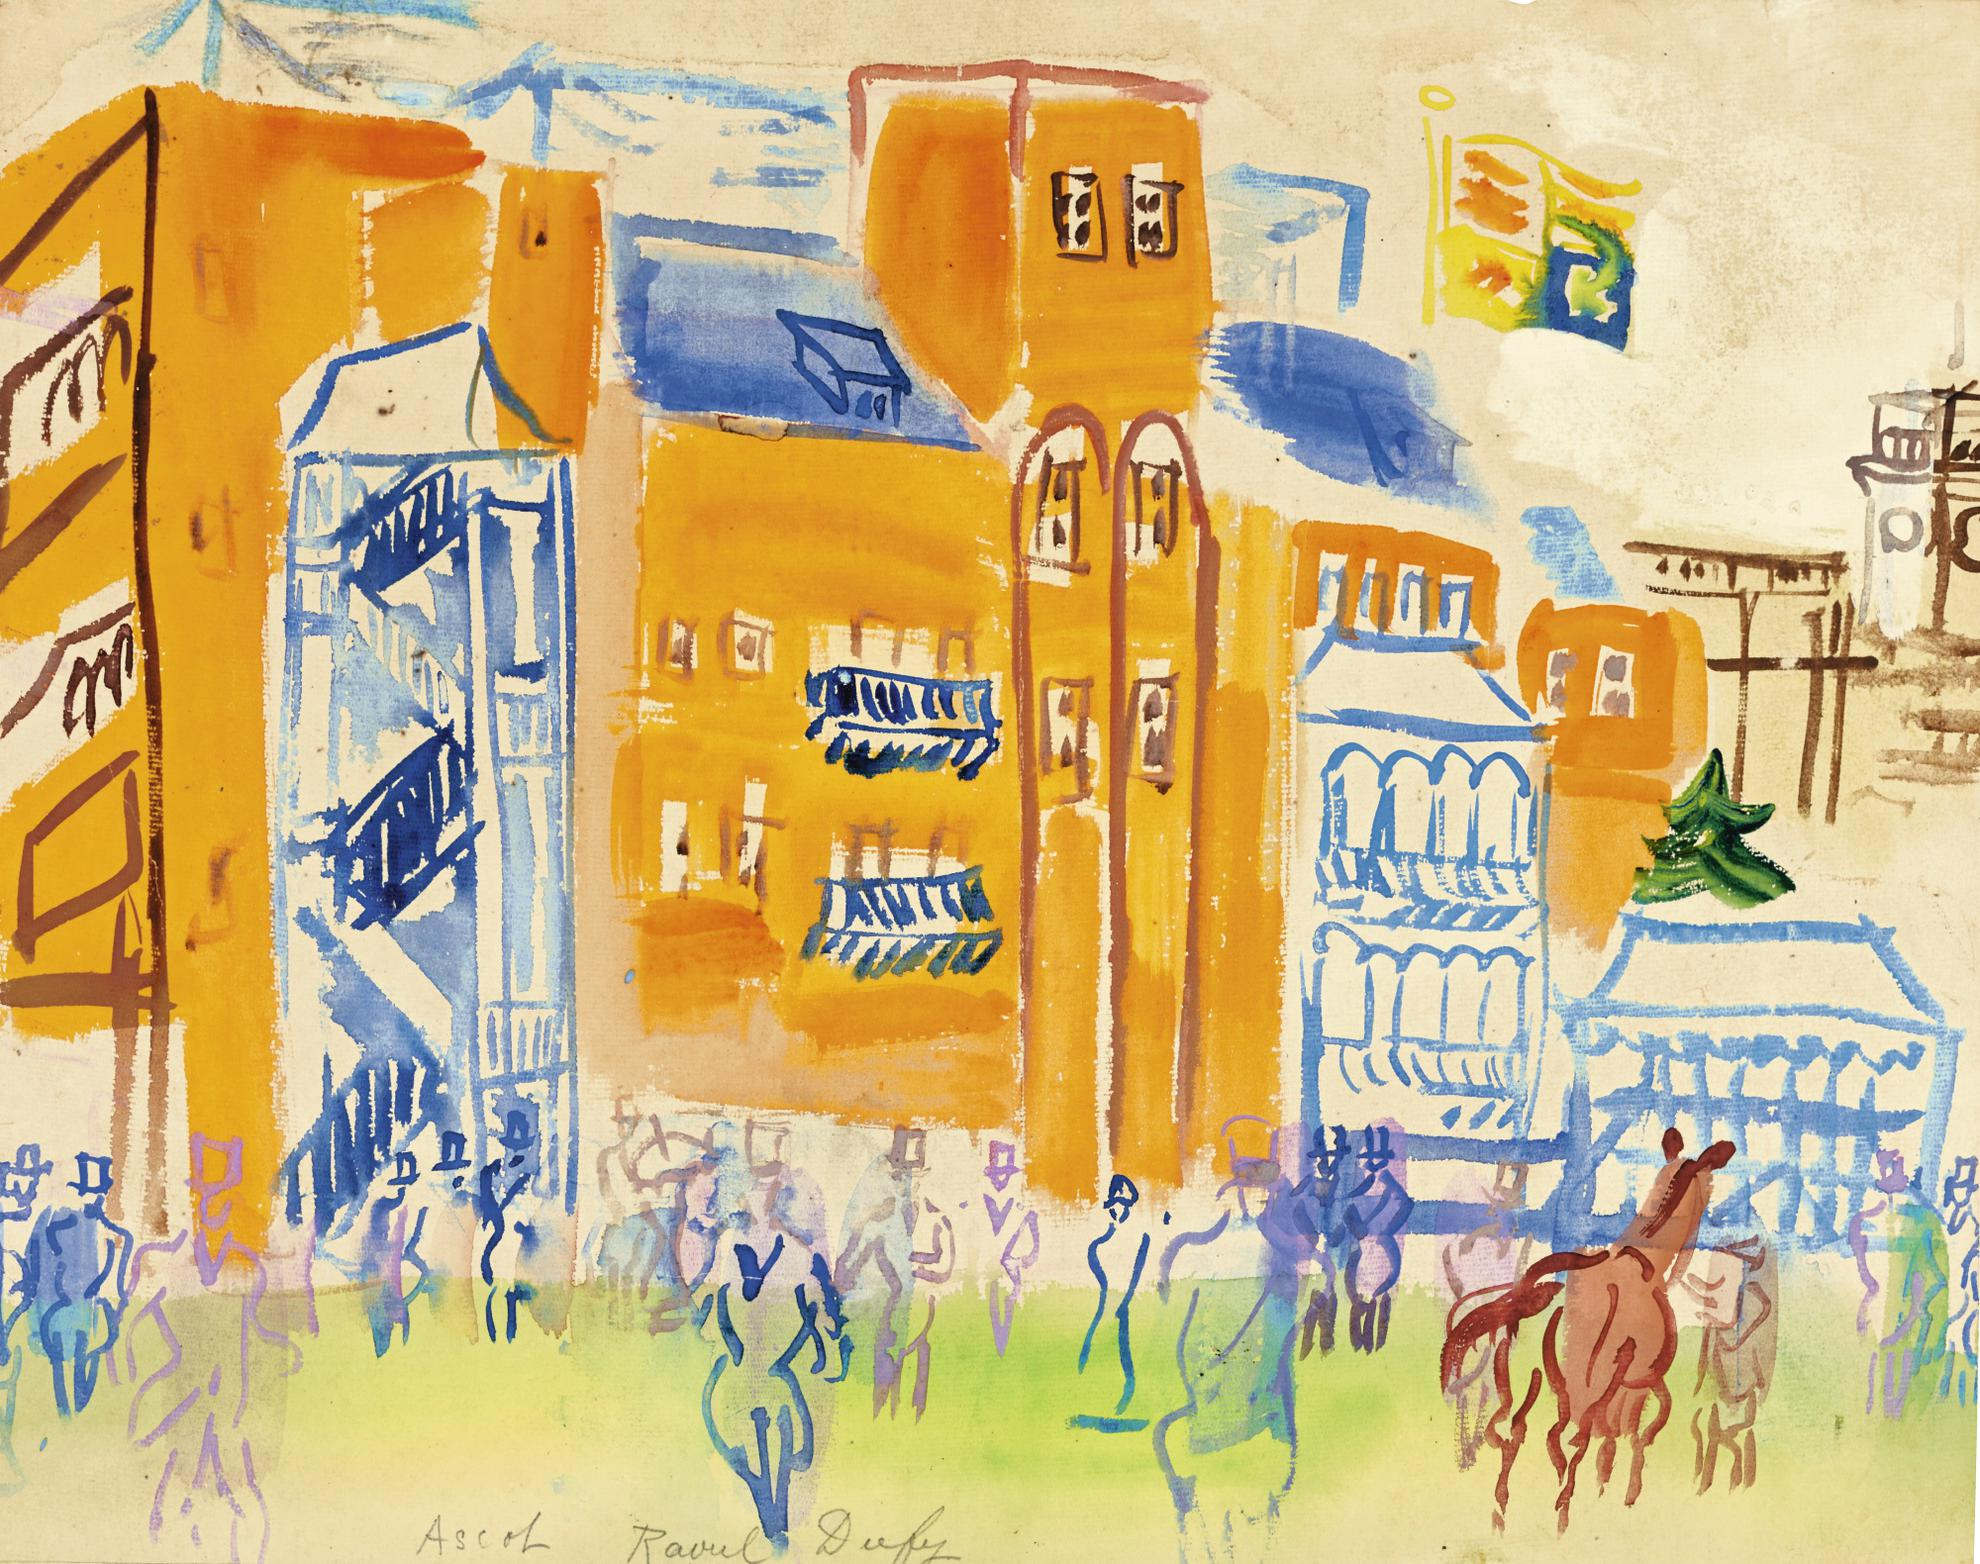 Raoul Dufy-Ascot, Les Tribunes-